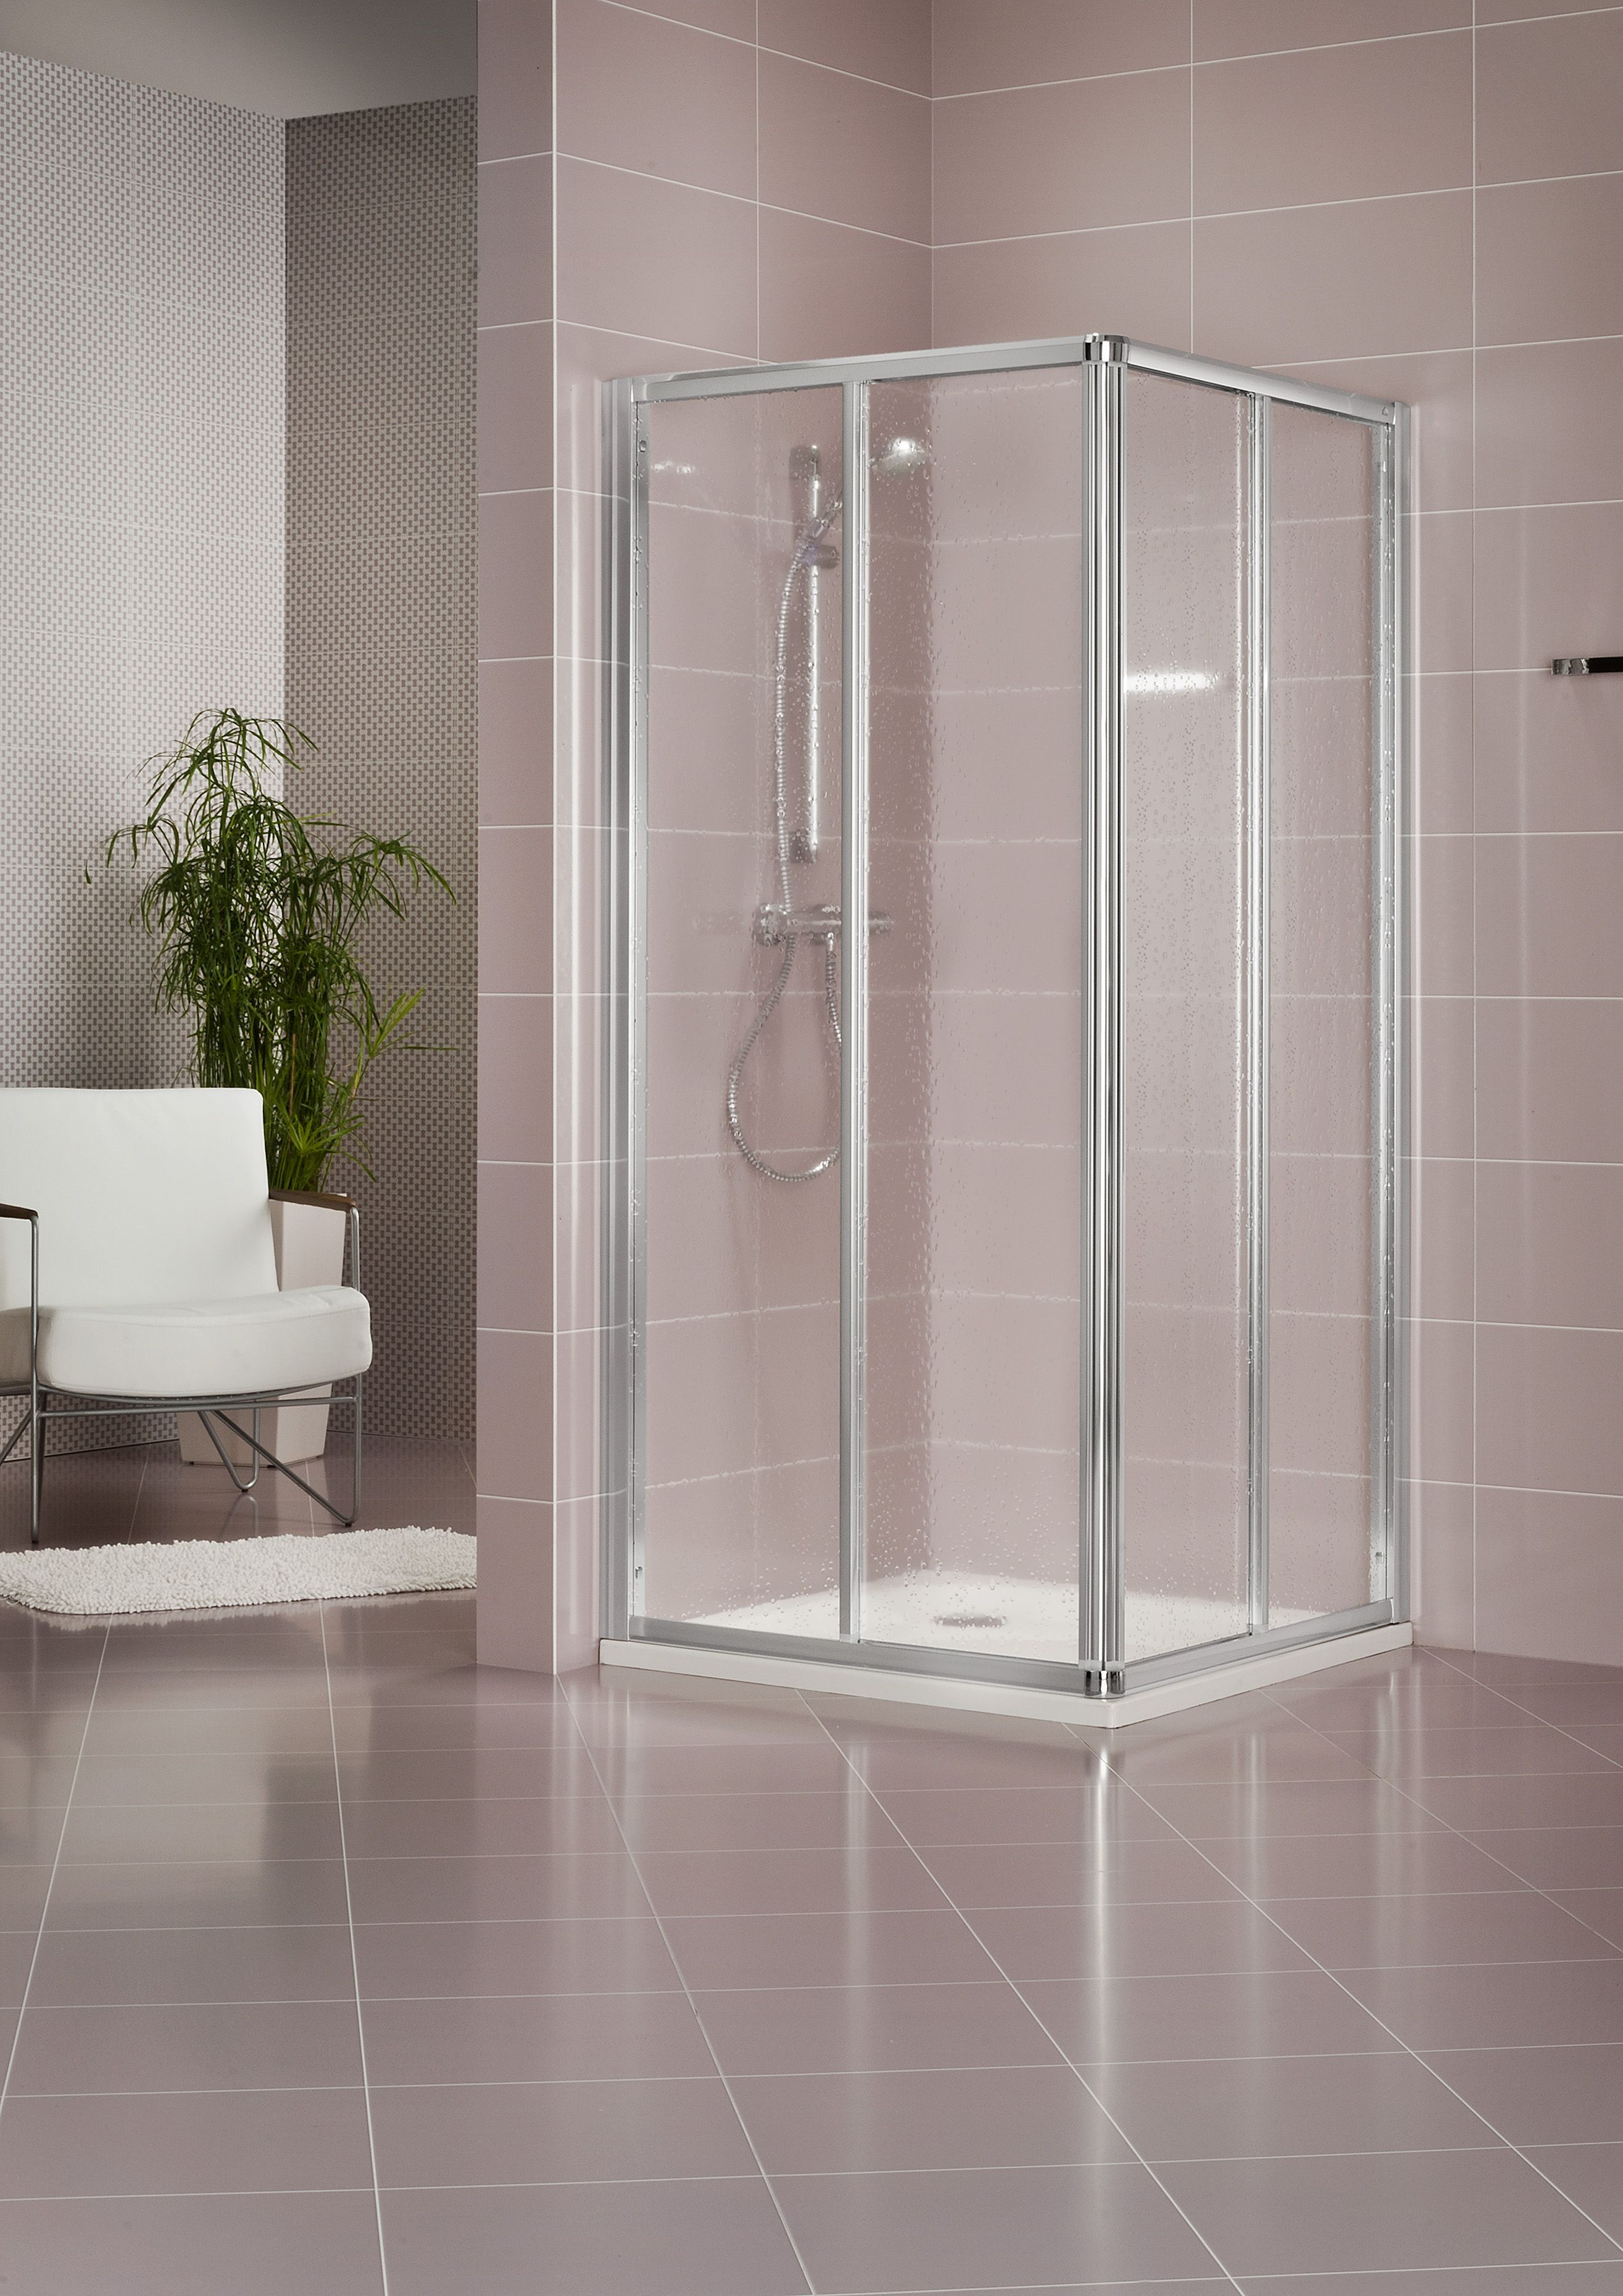 Dukessa 3000 In 2020 Corner Shower Enclosures Shower Enclosure Shower